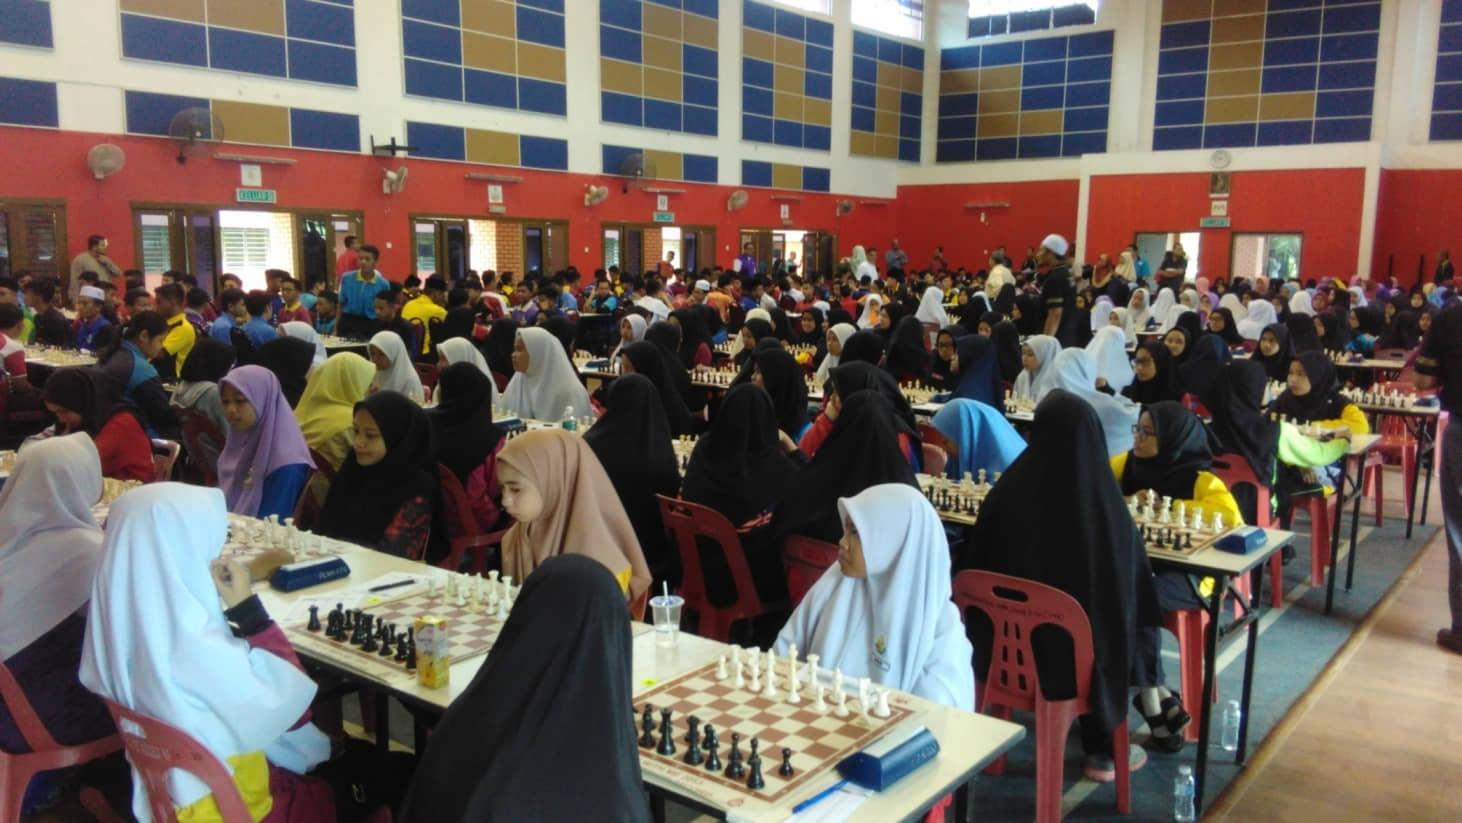 Kejohanan MSSK 2018 (Bachok)